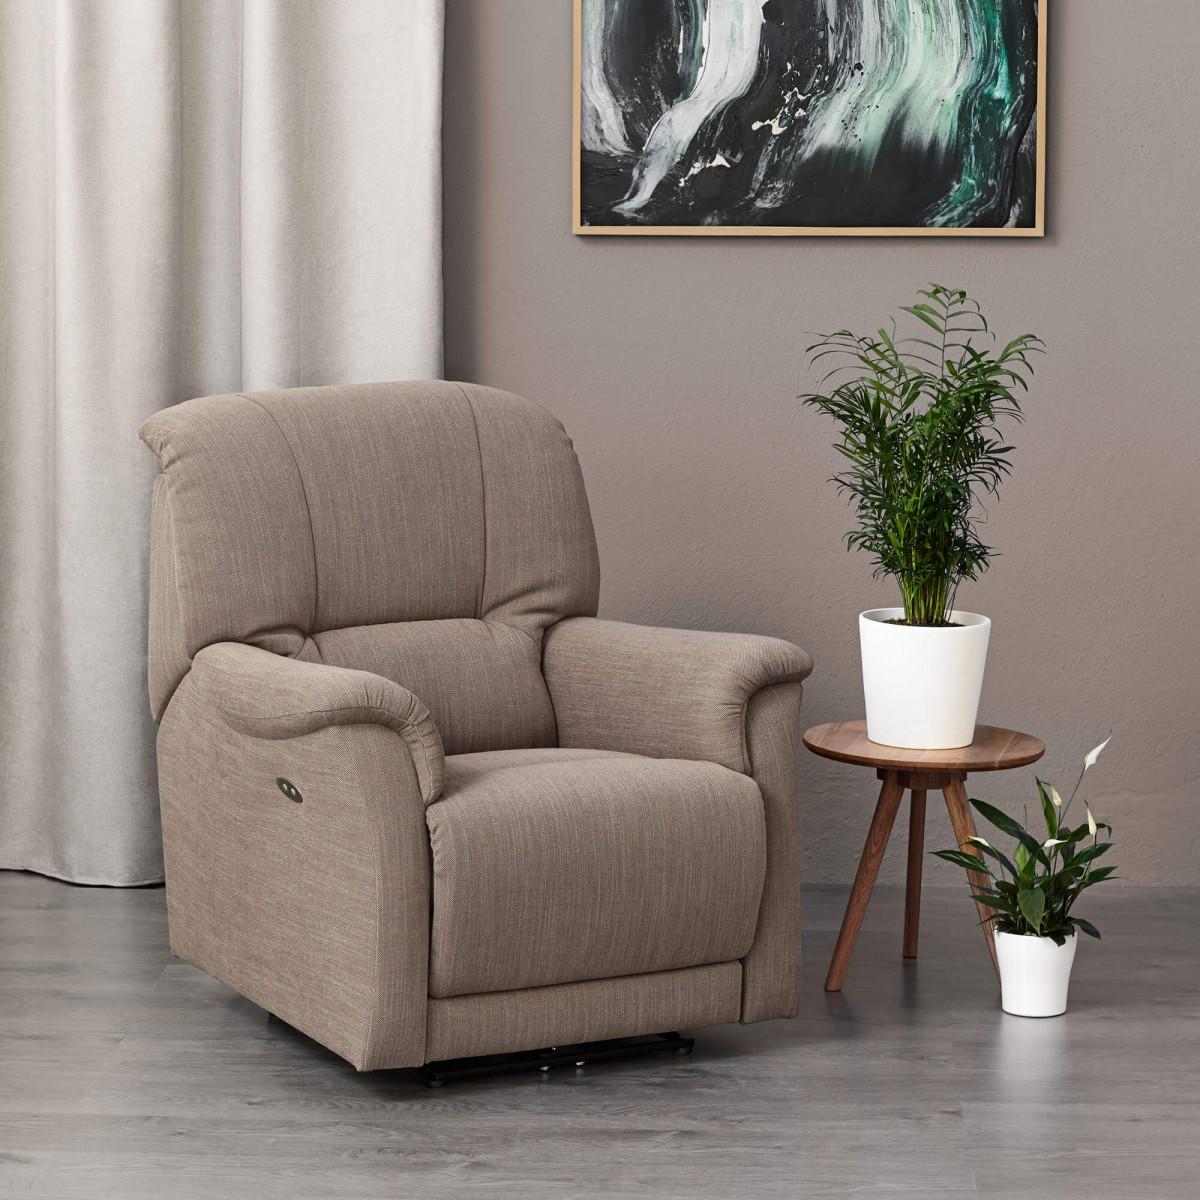 Jucar Reclining Armchair